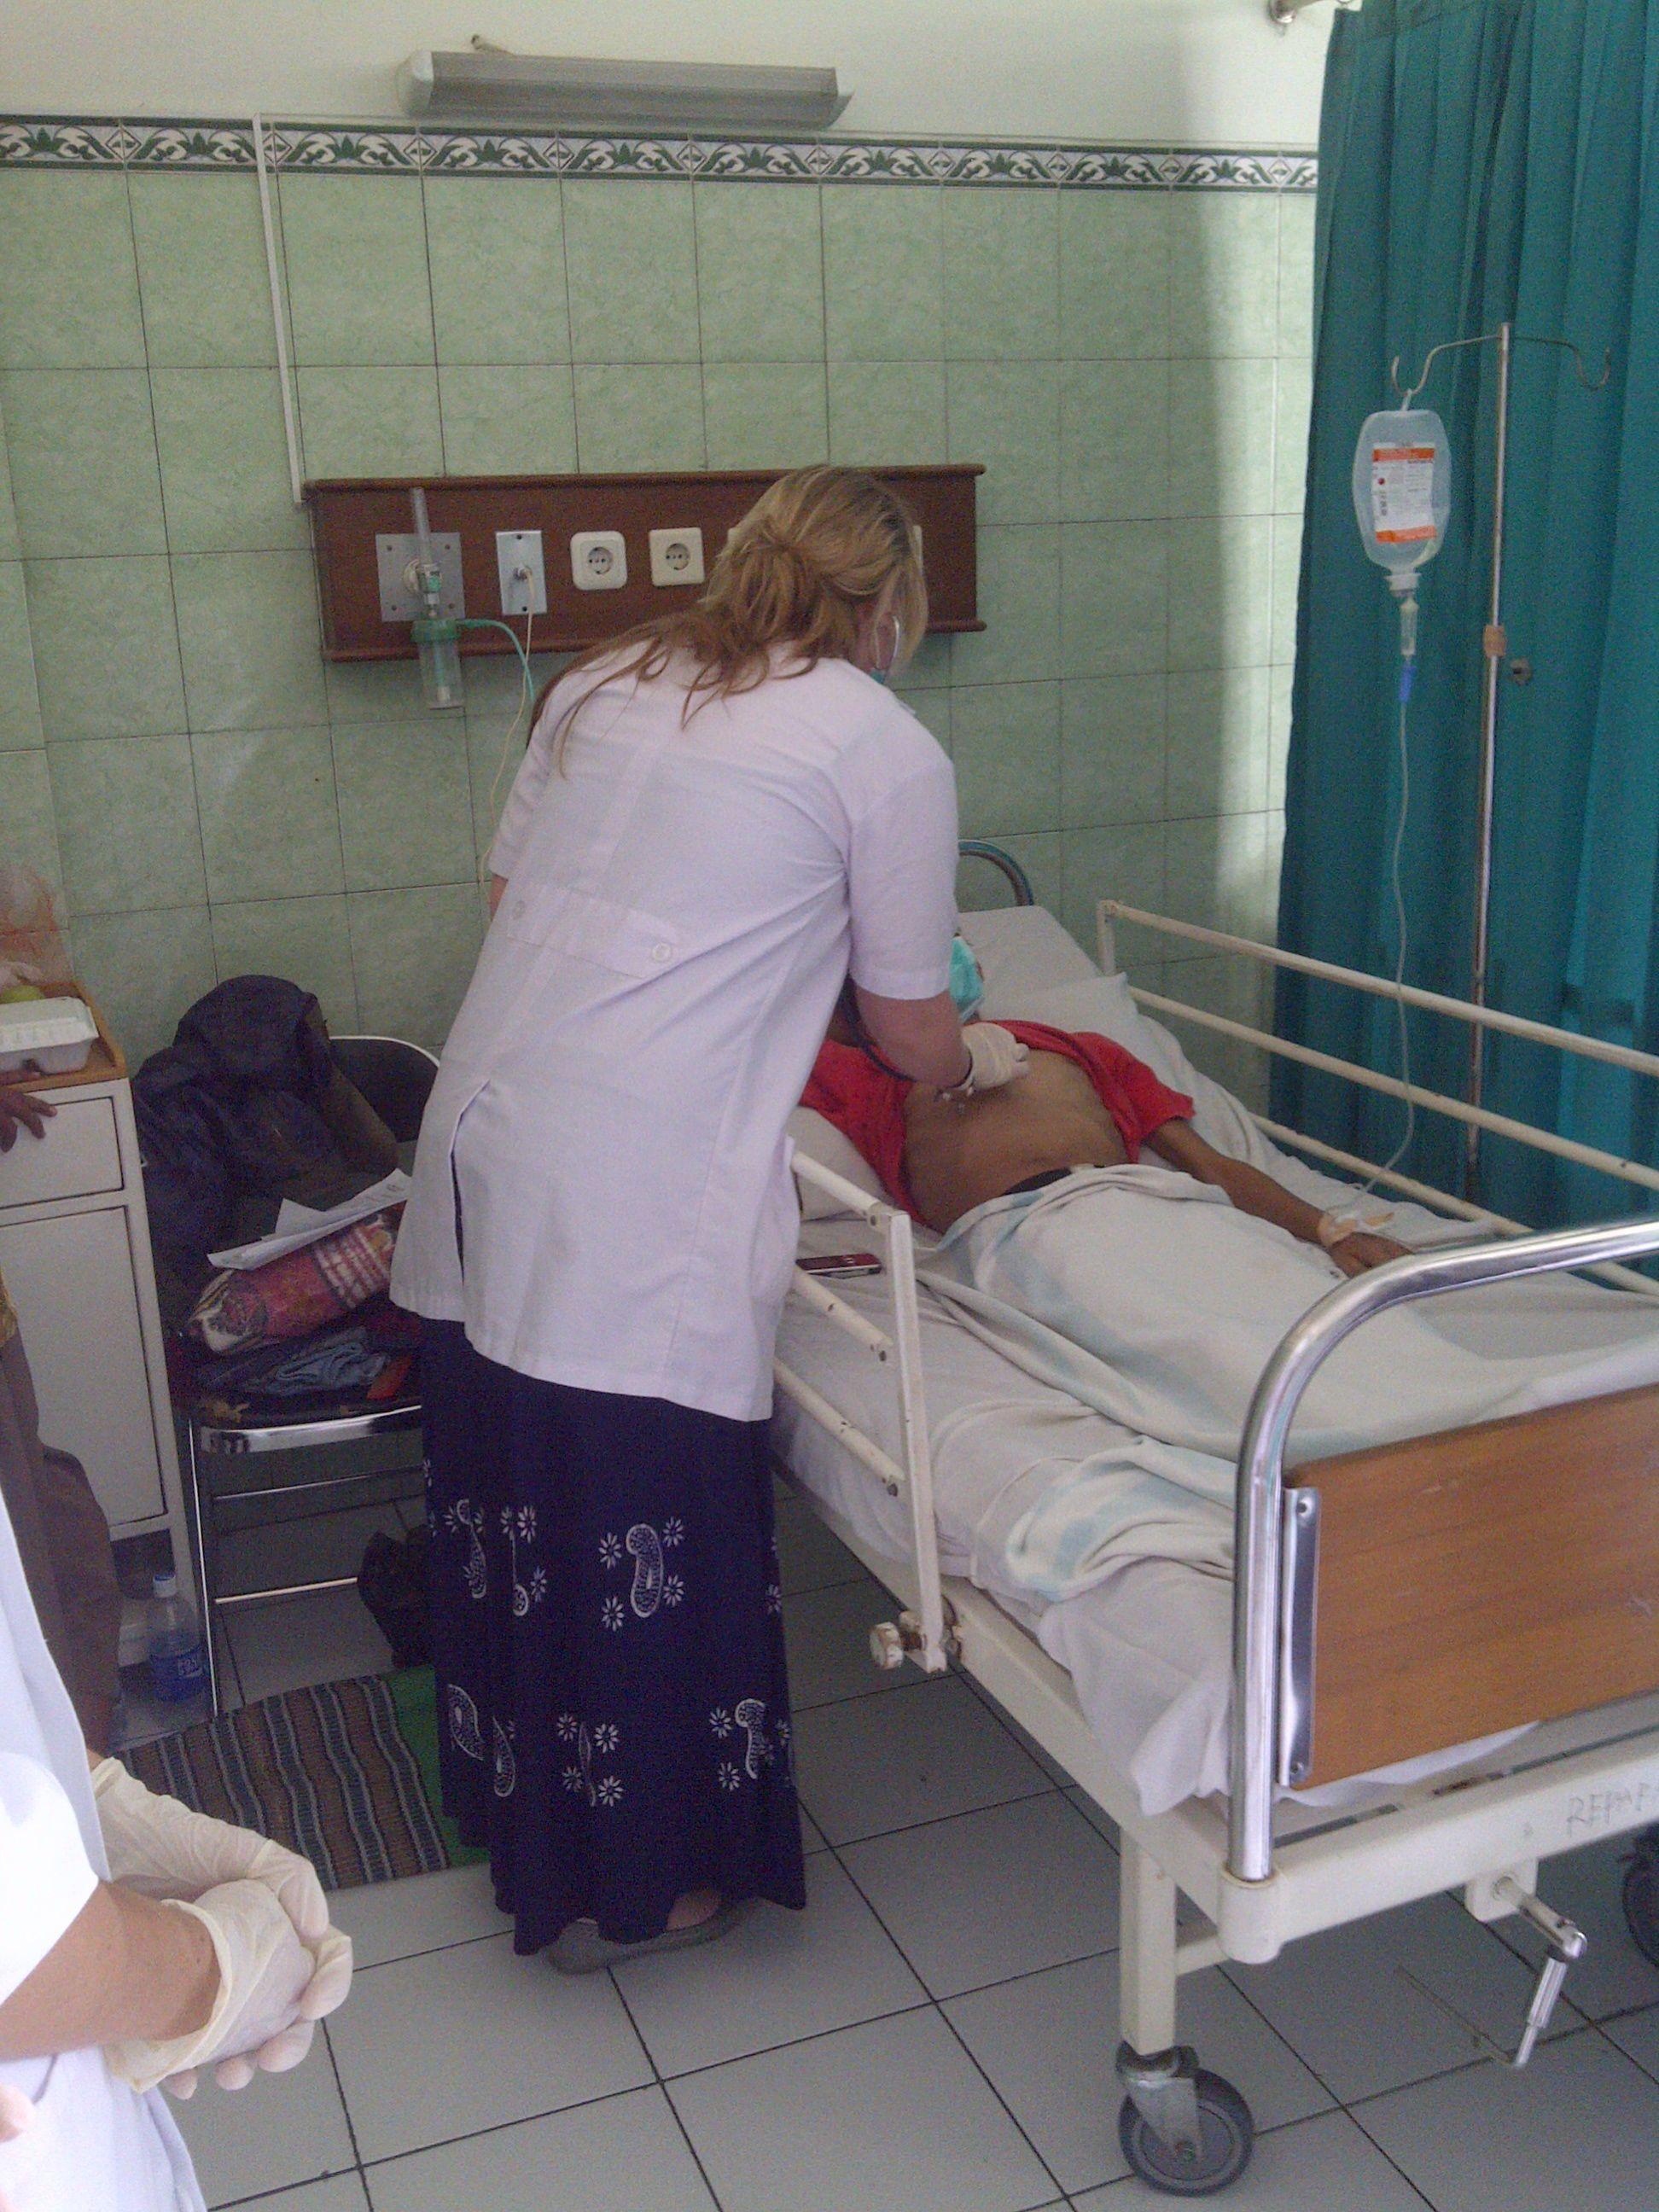 15 Orang Peserta Itmss Praktik Ke Rumah Sakit Penembahan Senopati Bantul Universitas Muhammadiyah Yogyakarta